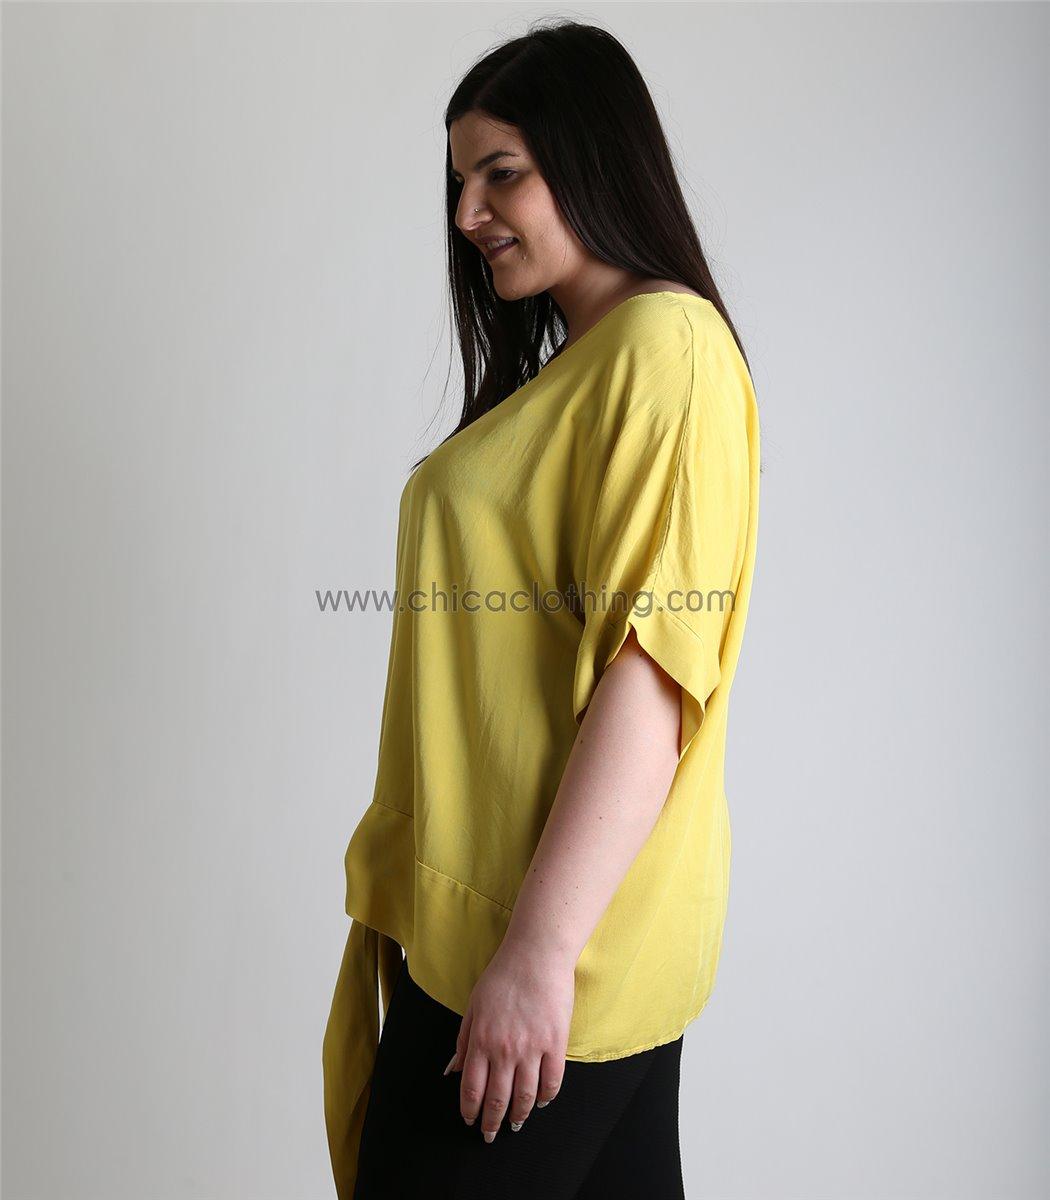 aff121c4bd4c Γυναικεία κίτρινη μπλούζα με δέσιμο oversized